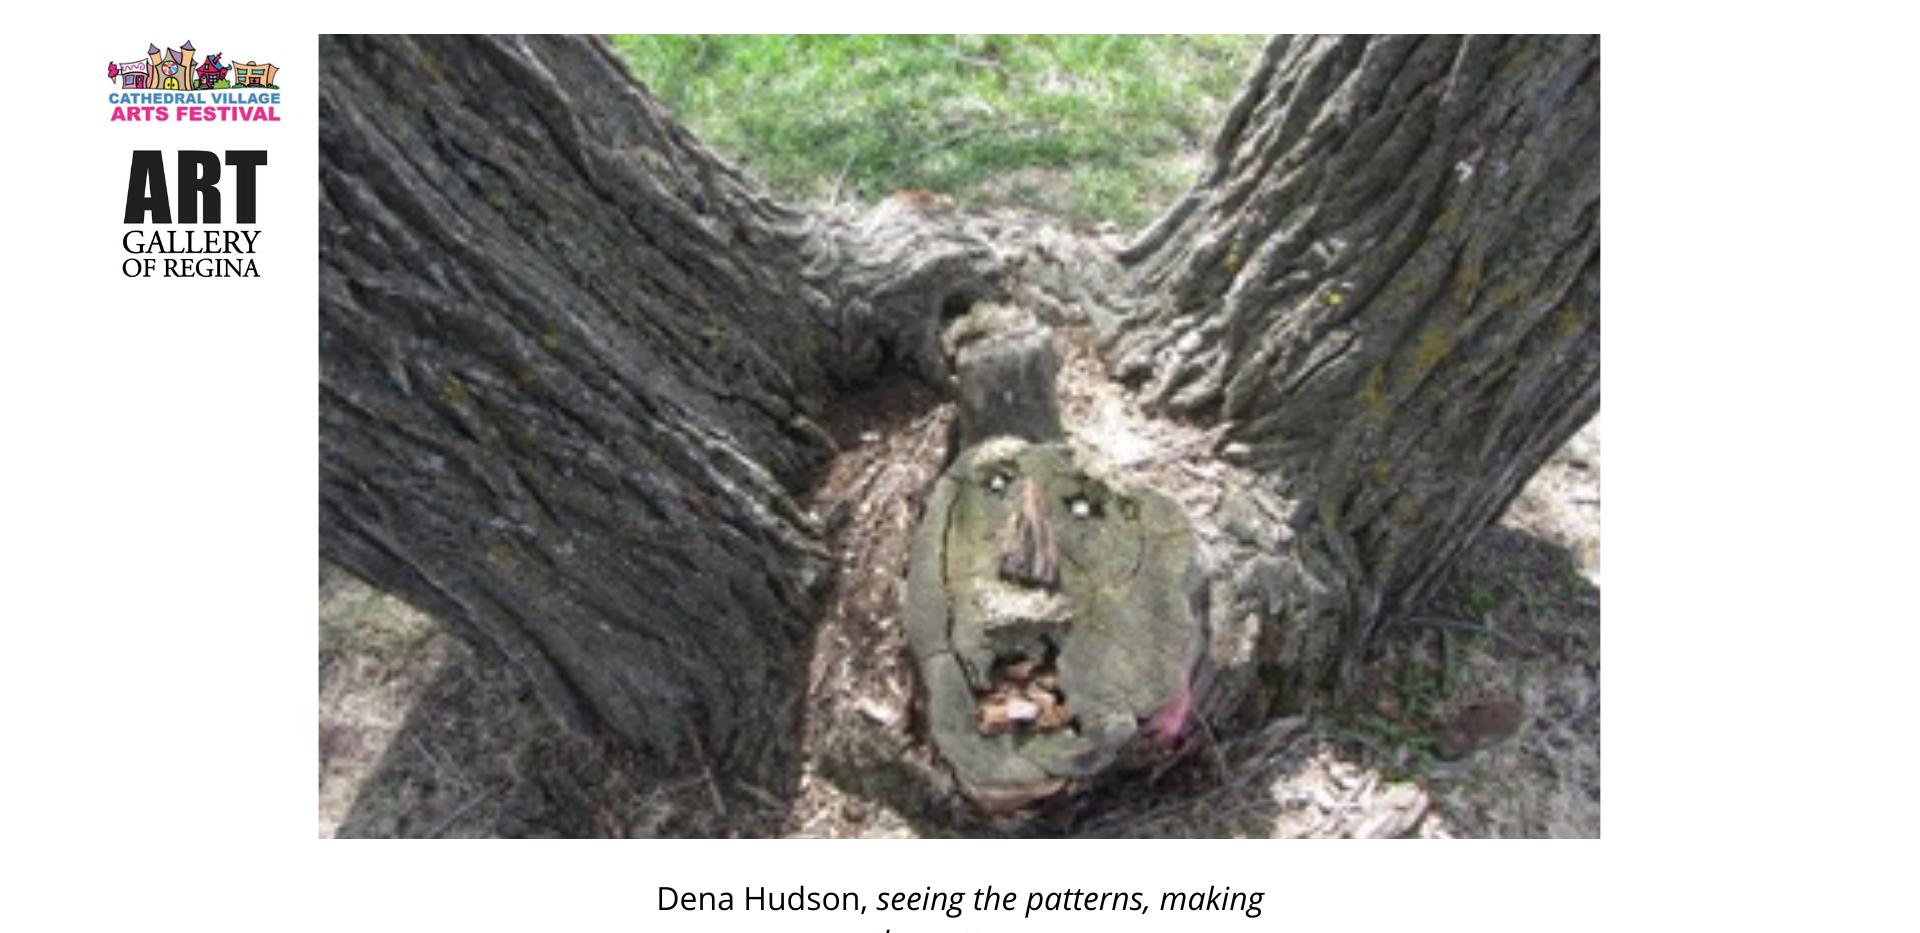 DenaHudson, seeing the patterns, making the patterns.